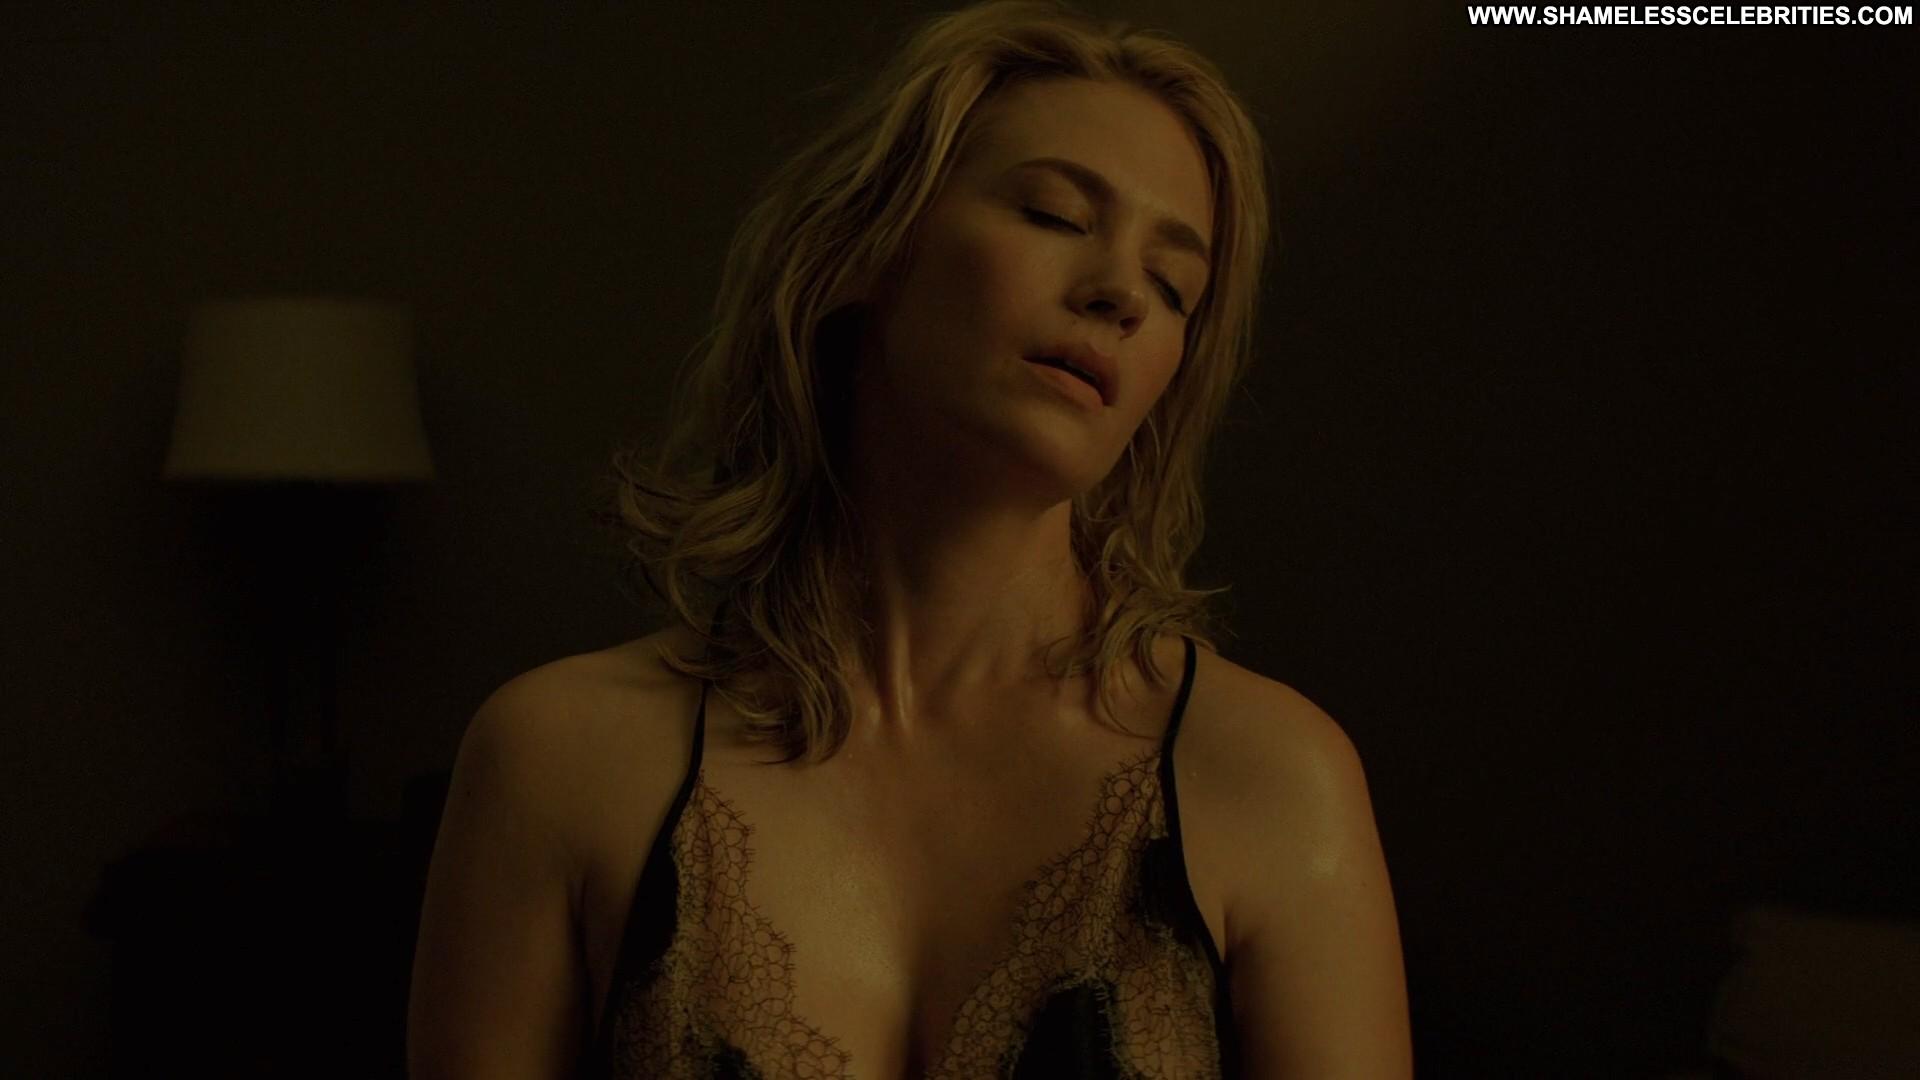 Film posing sex woman really